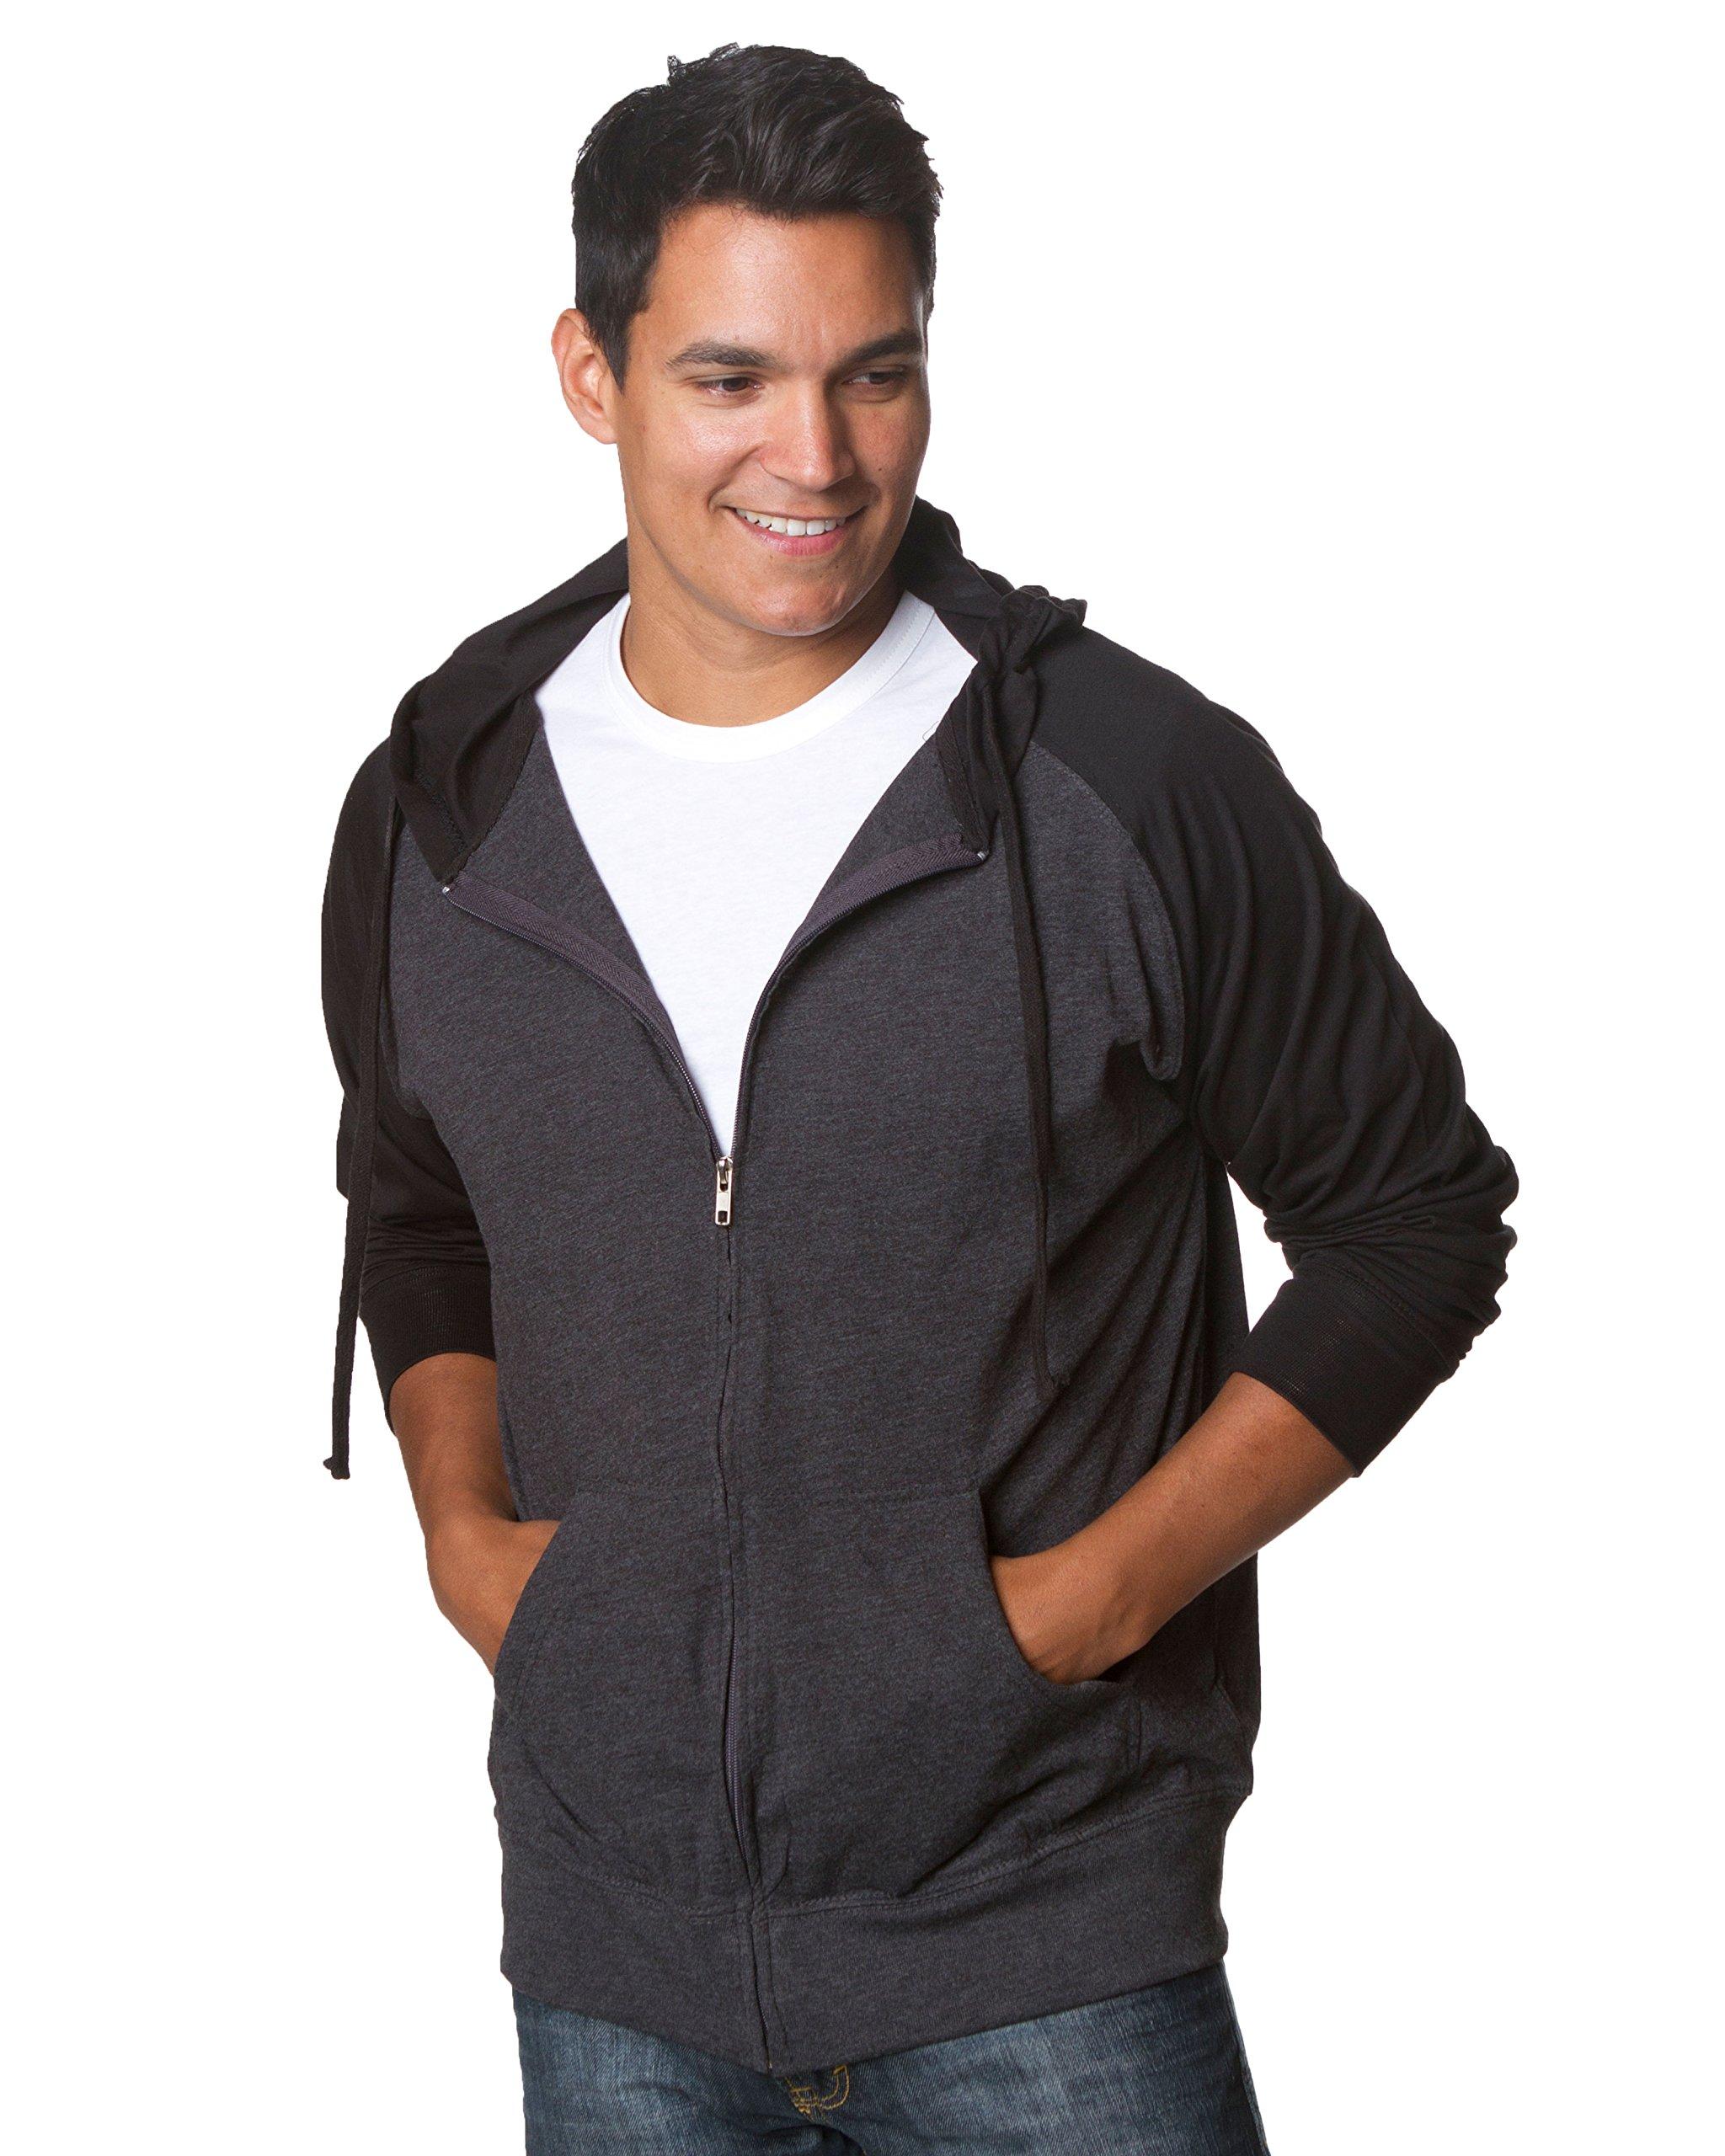 Mens Lightweight Hoodie Soft T-Shirt with Zipper and Pockets XL Charcoal/Black